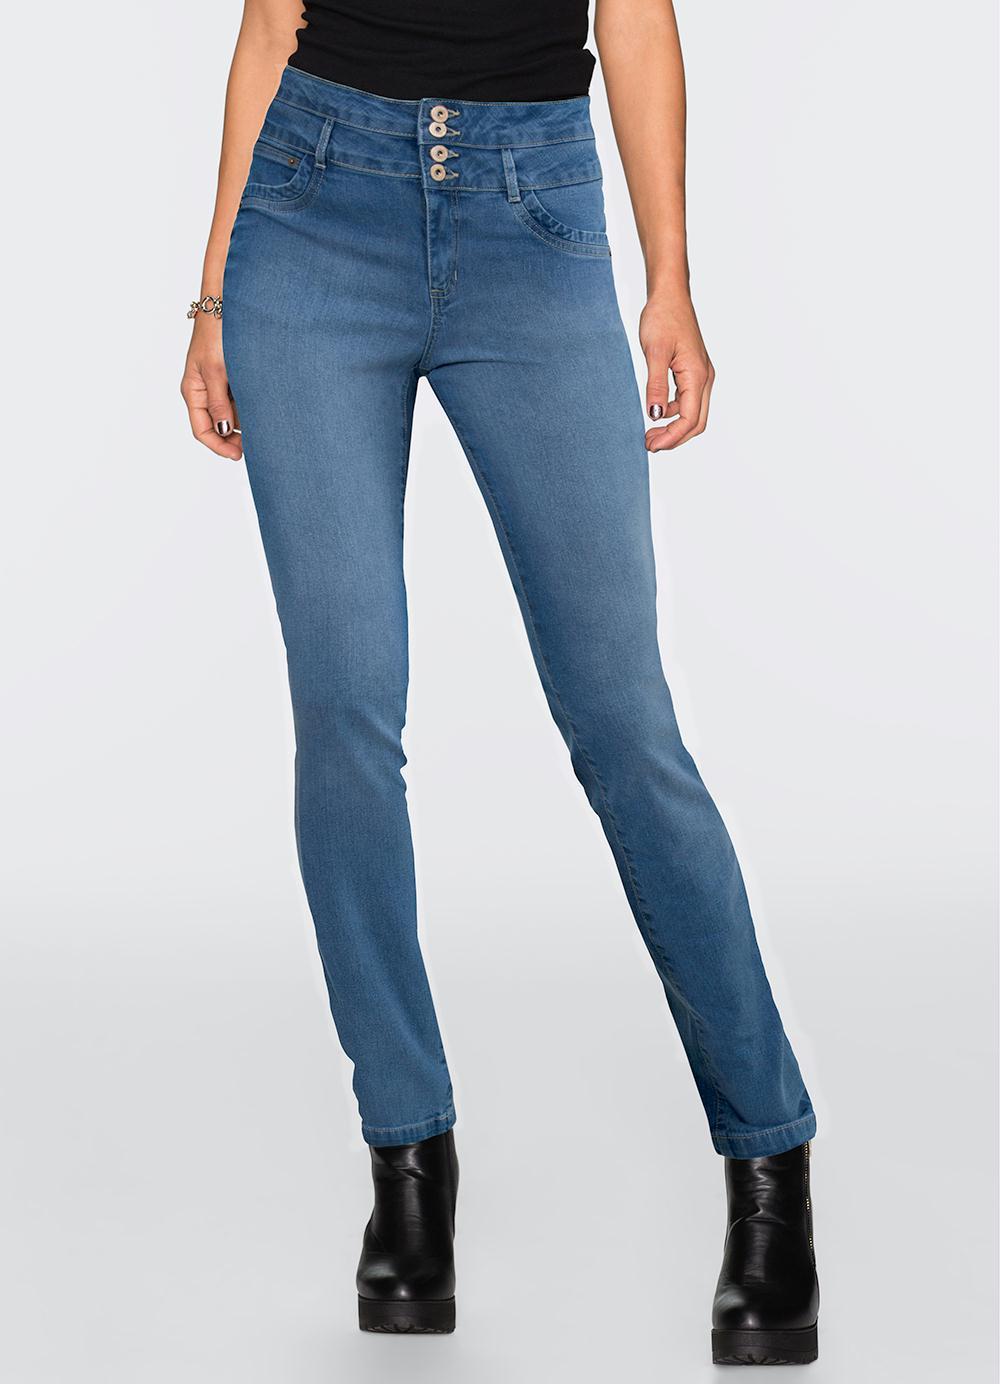 8483b9a80 Calça Jeans Skinny Azul Médio - bonprix